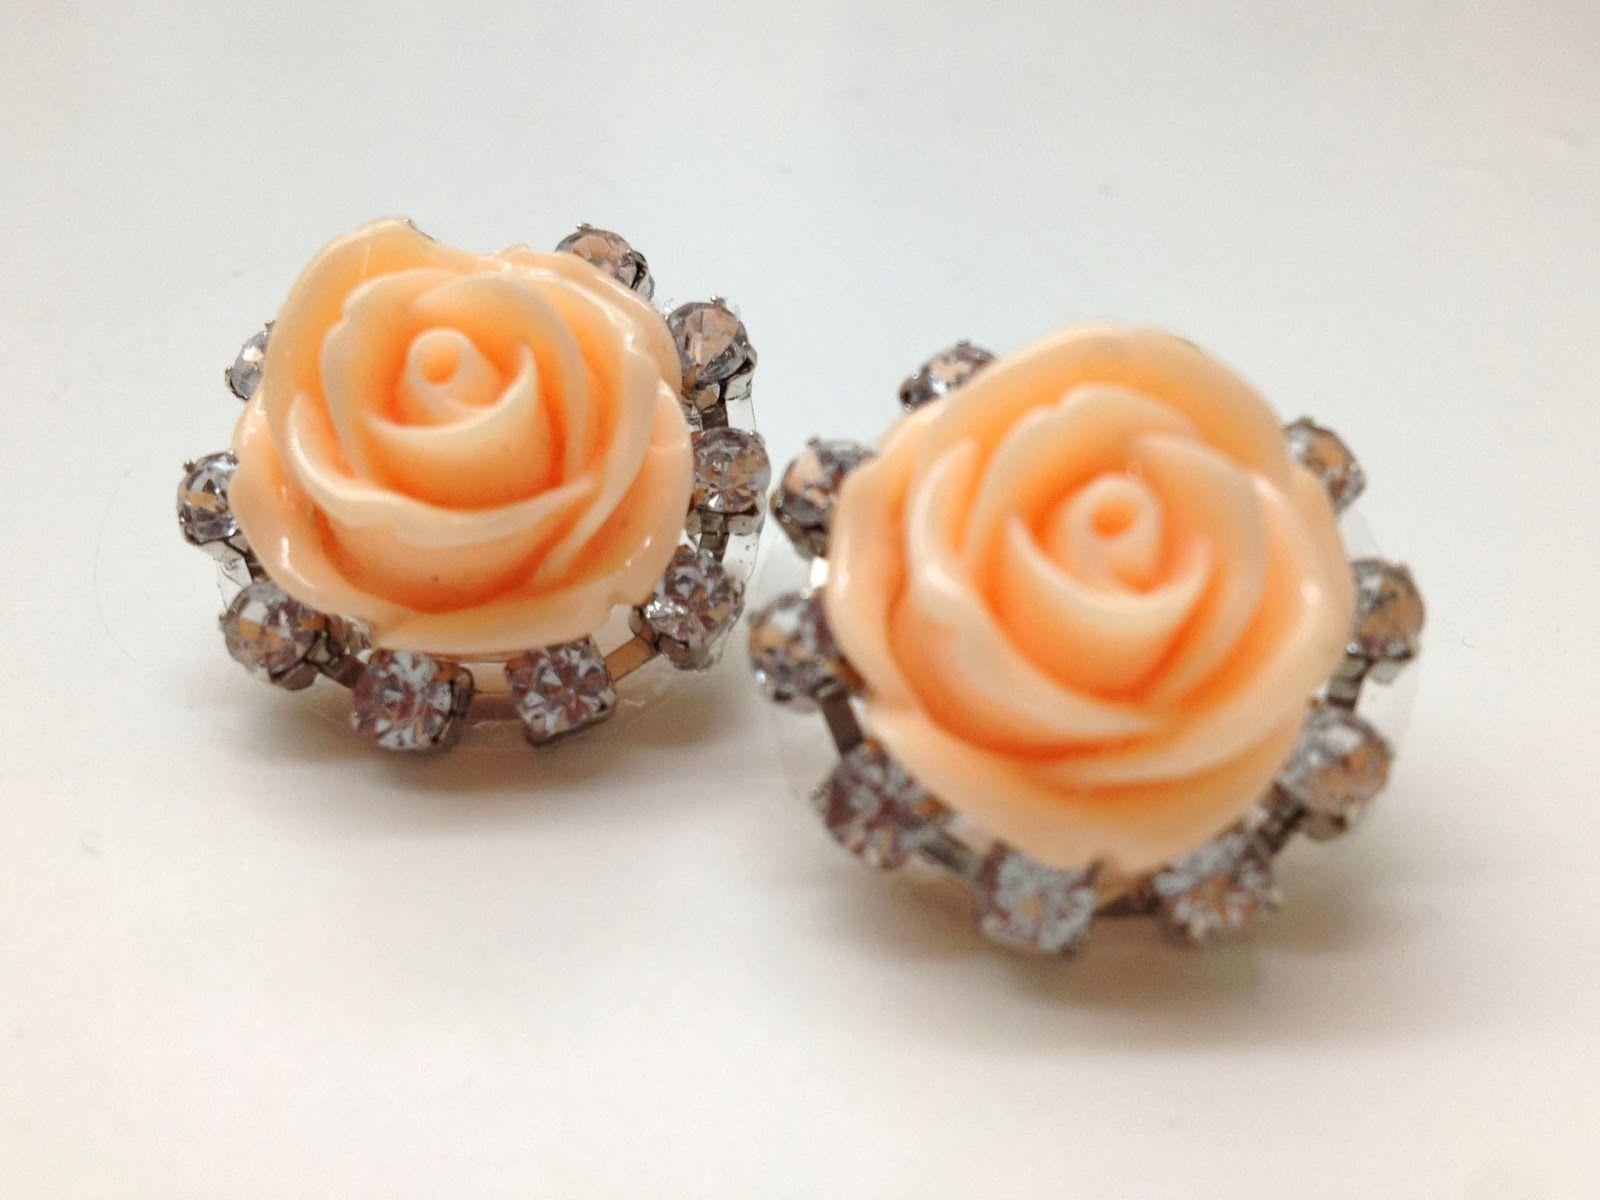 Lila & Sirena Betsey Johnson Inspired Earrings  http://lilasirena.blogspot.mx/2014/01/diy-rose-and-crystal-stud-earrings.html